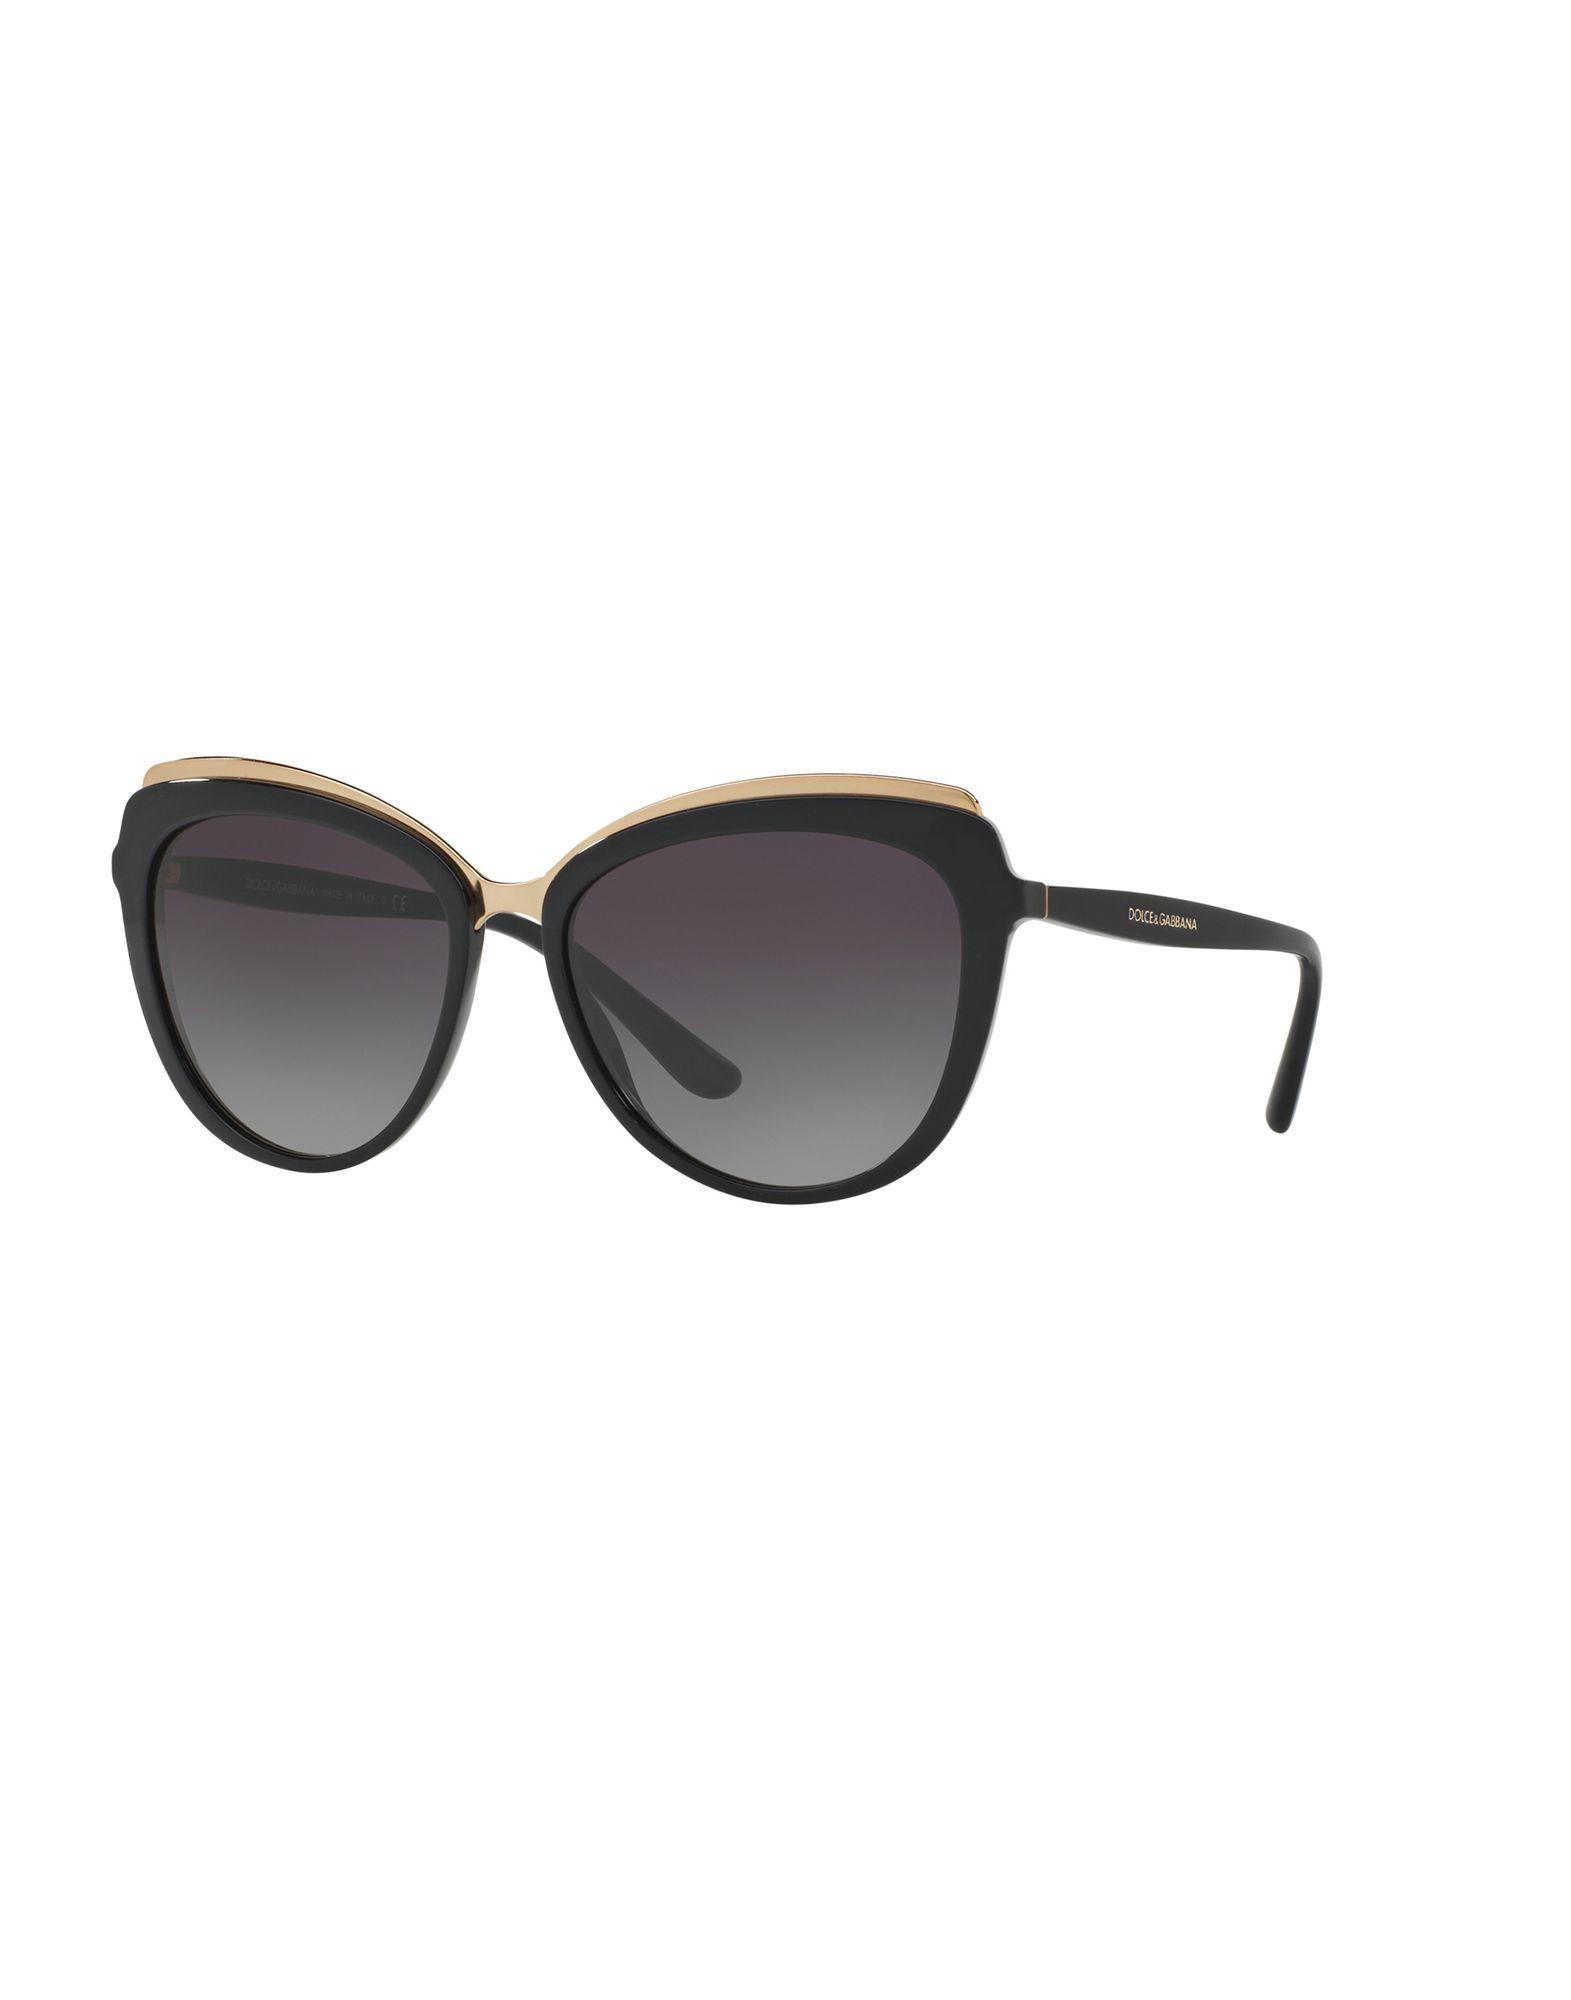 Occhiali Da Sole Dolce & Gabbana Dg4304 - Donna - Acquista online su